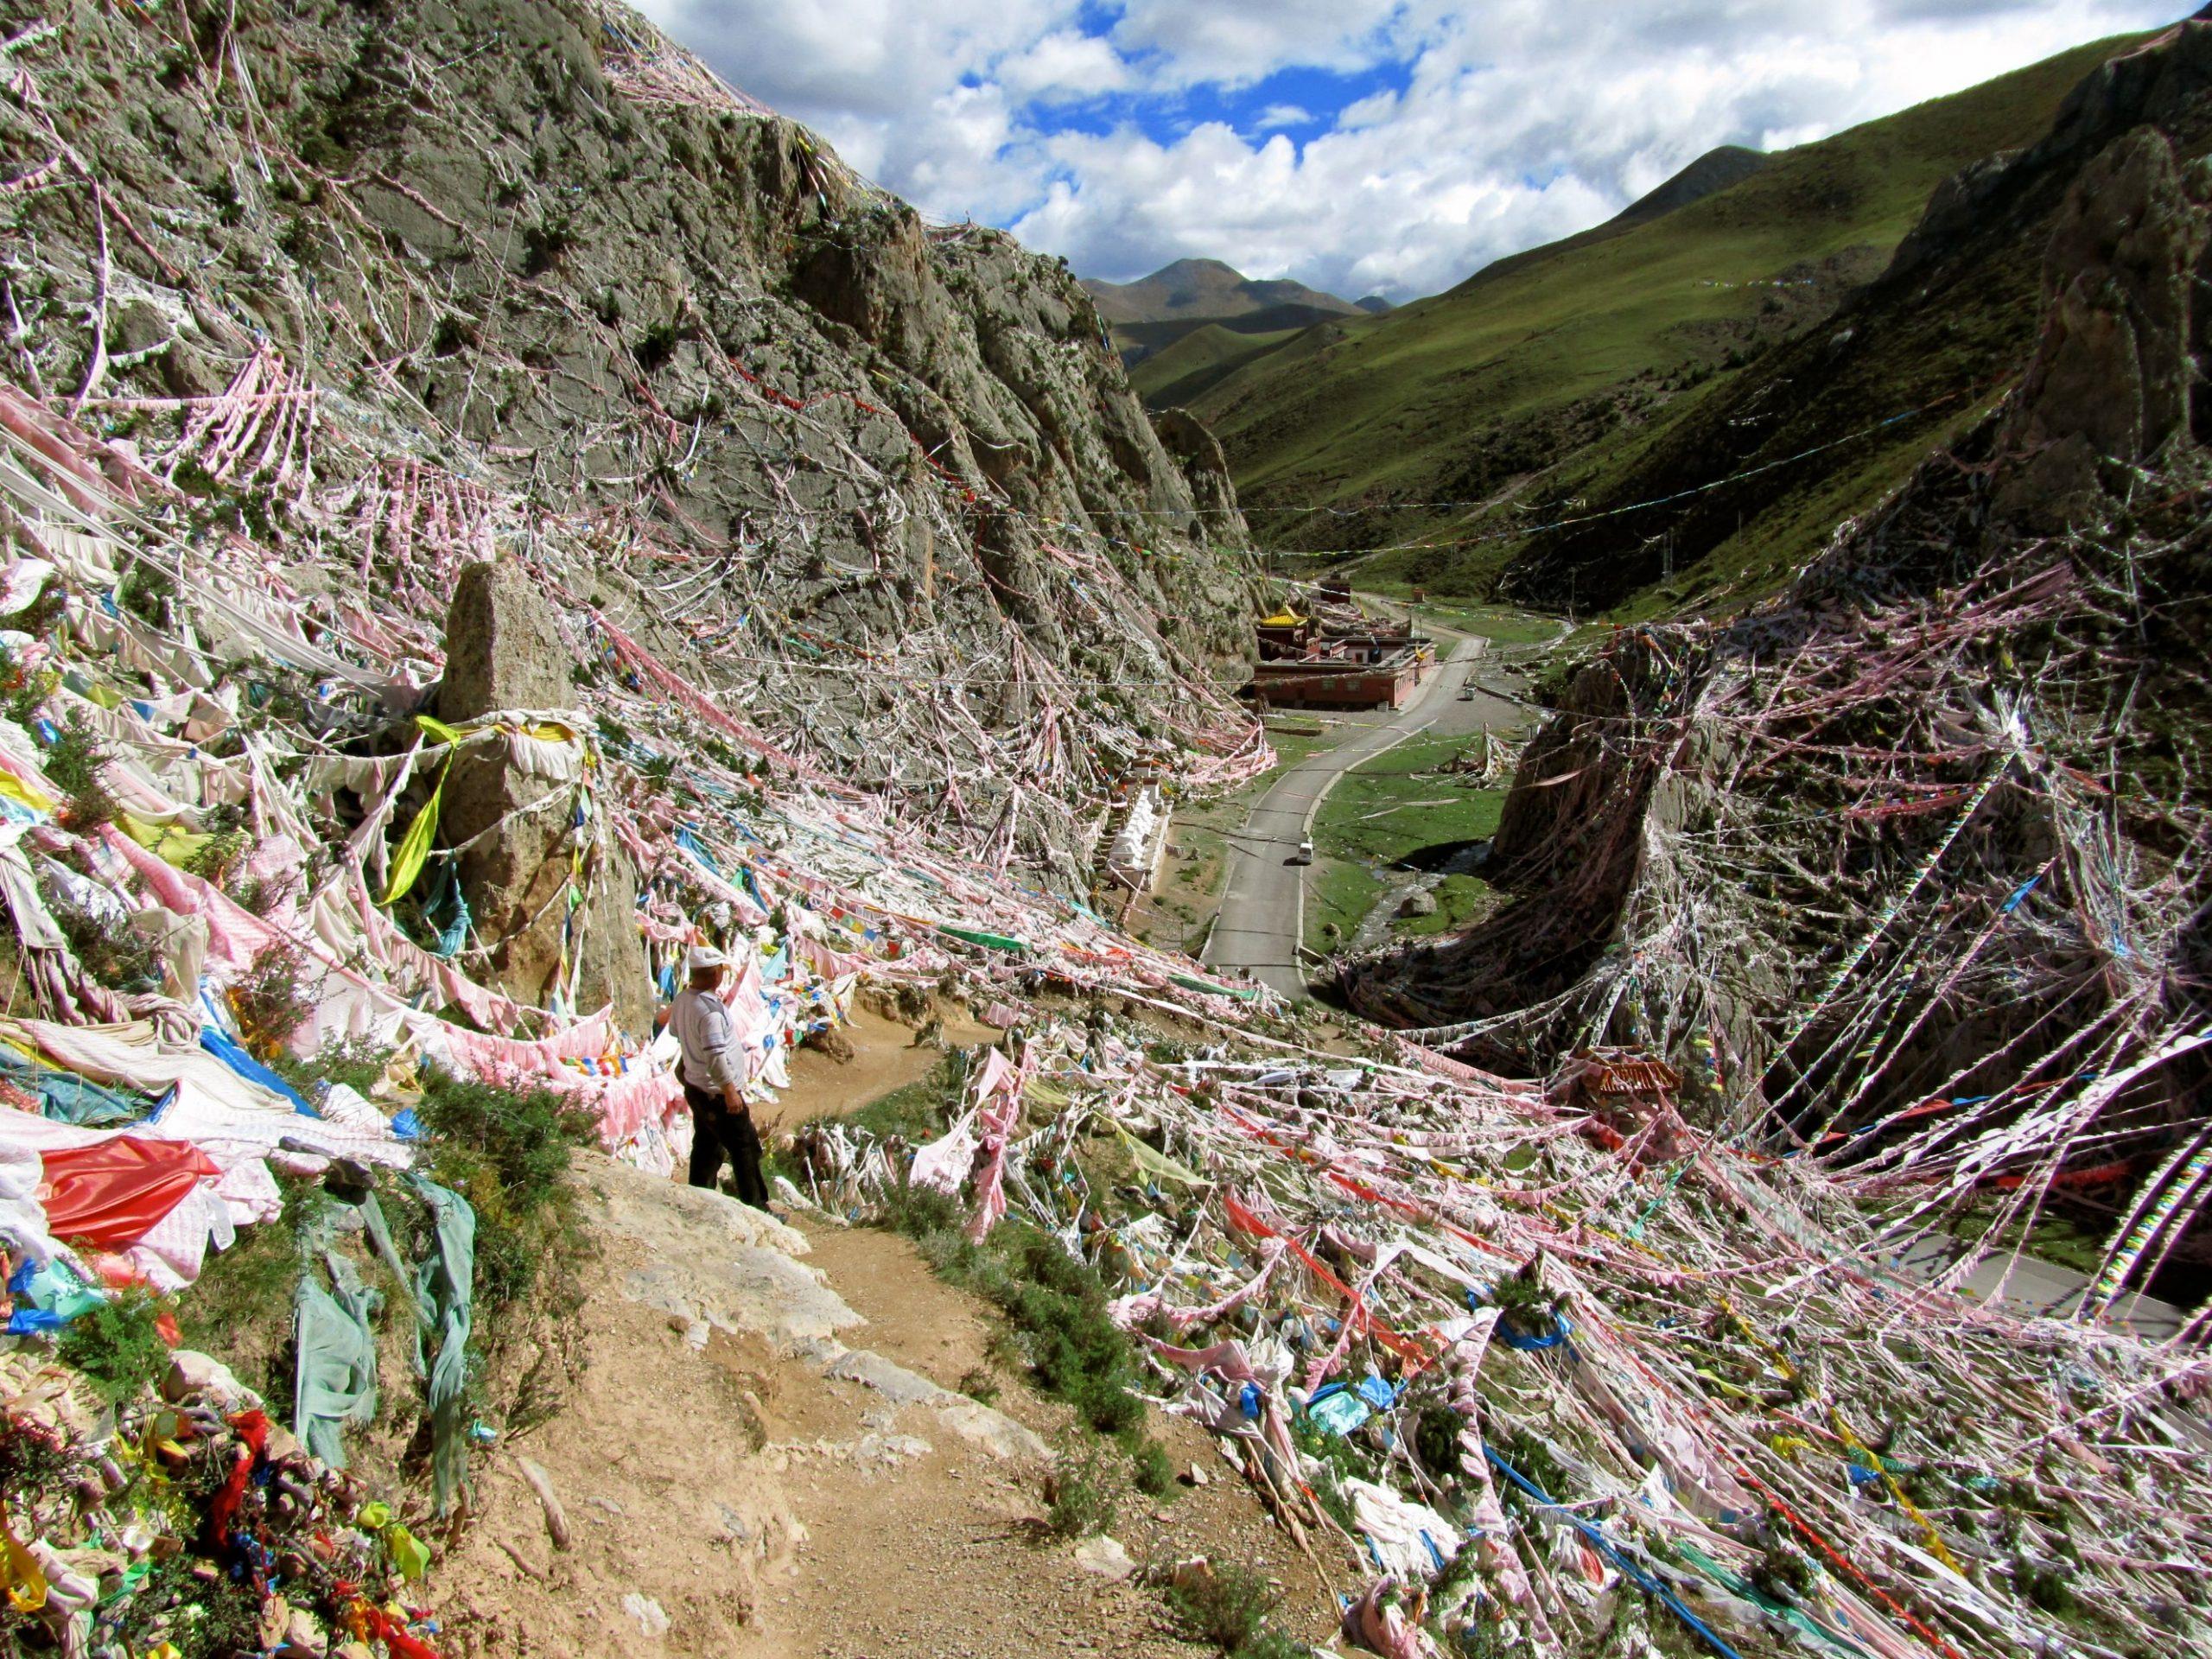 Wenchu monastery, Yushu, Amdo